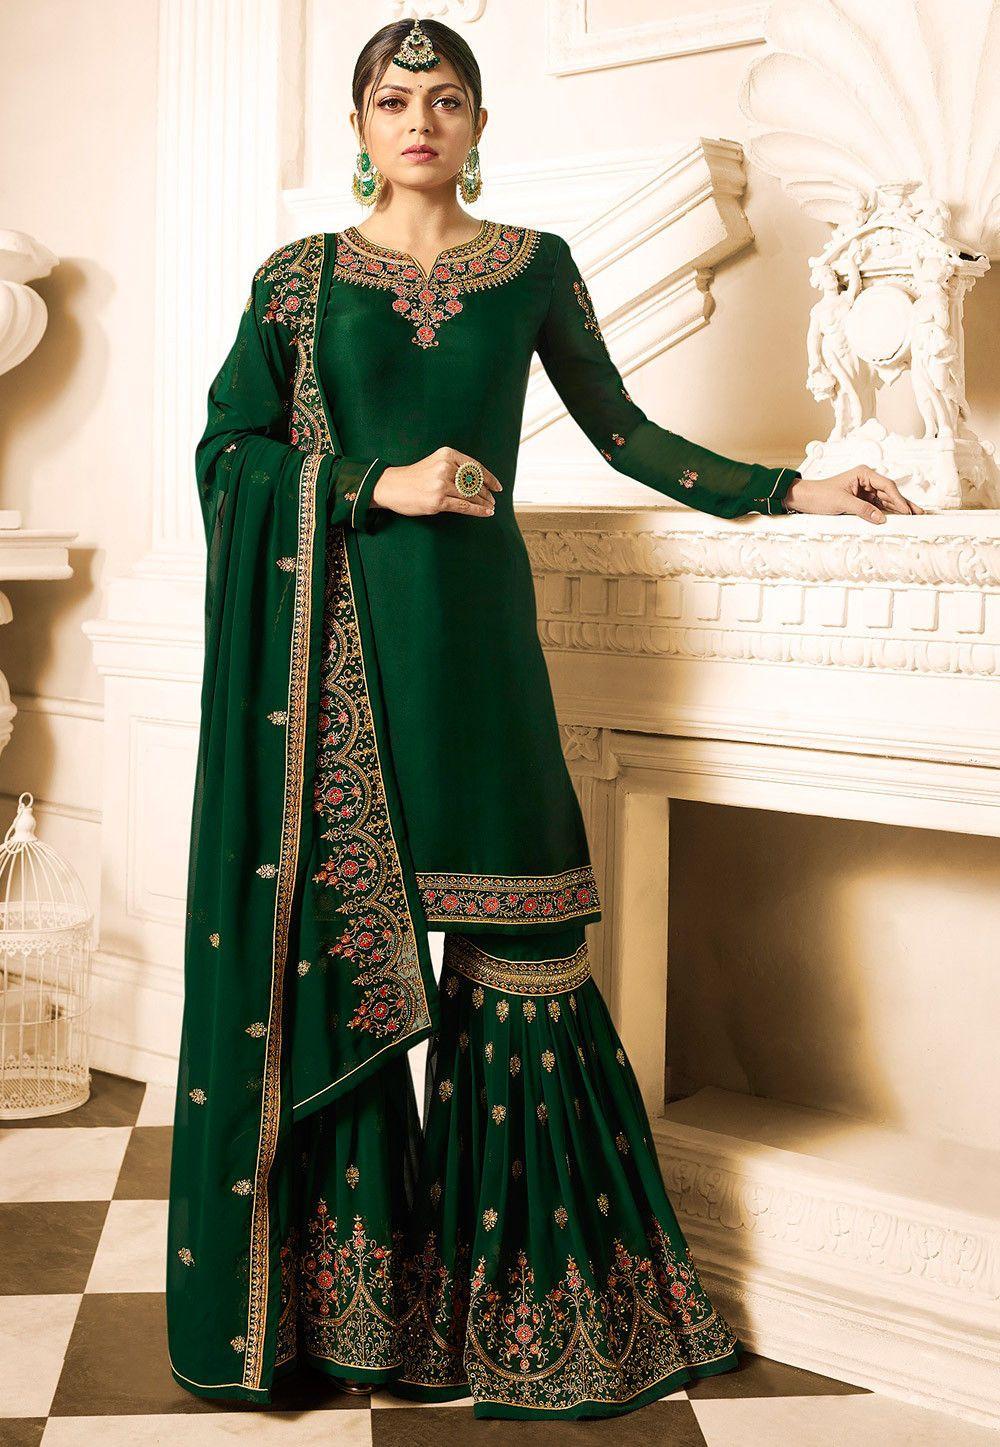 77c39add7e Embroidered Satin Georgette Pakistani Suit in Dark Green : KCH2270 ...